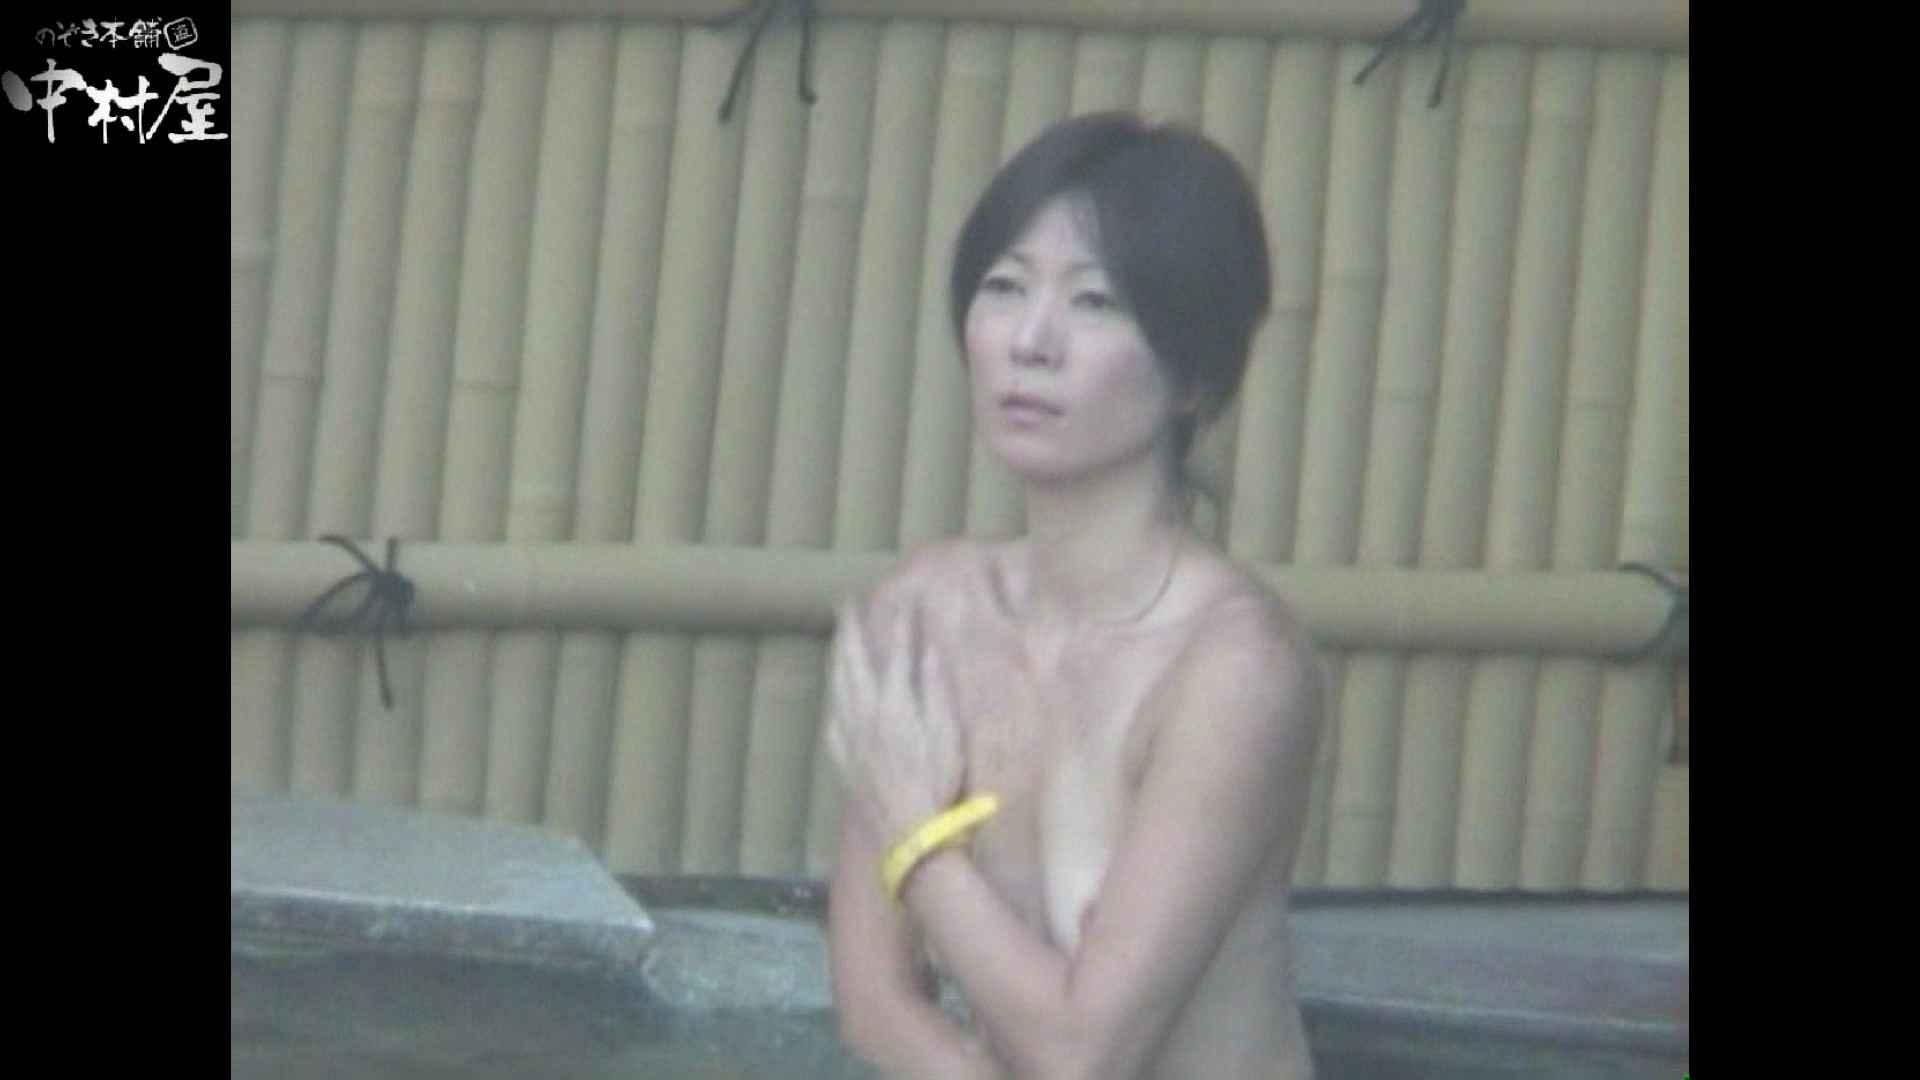 Aquaな露天風呂Vol.972 露天   OLセックス  80画像 79